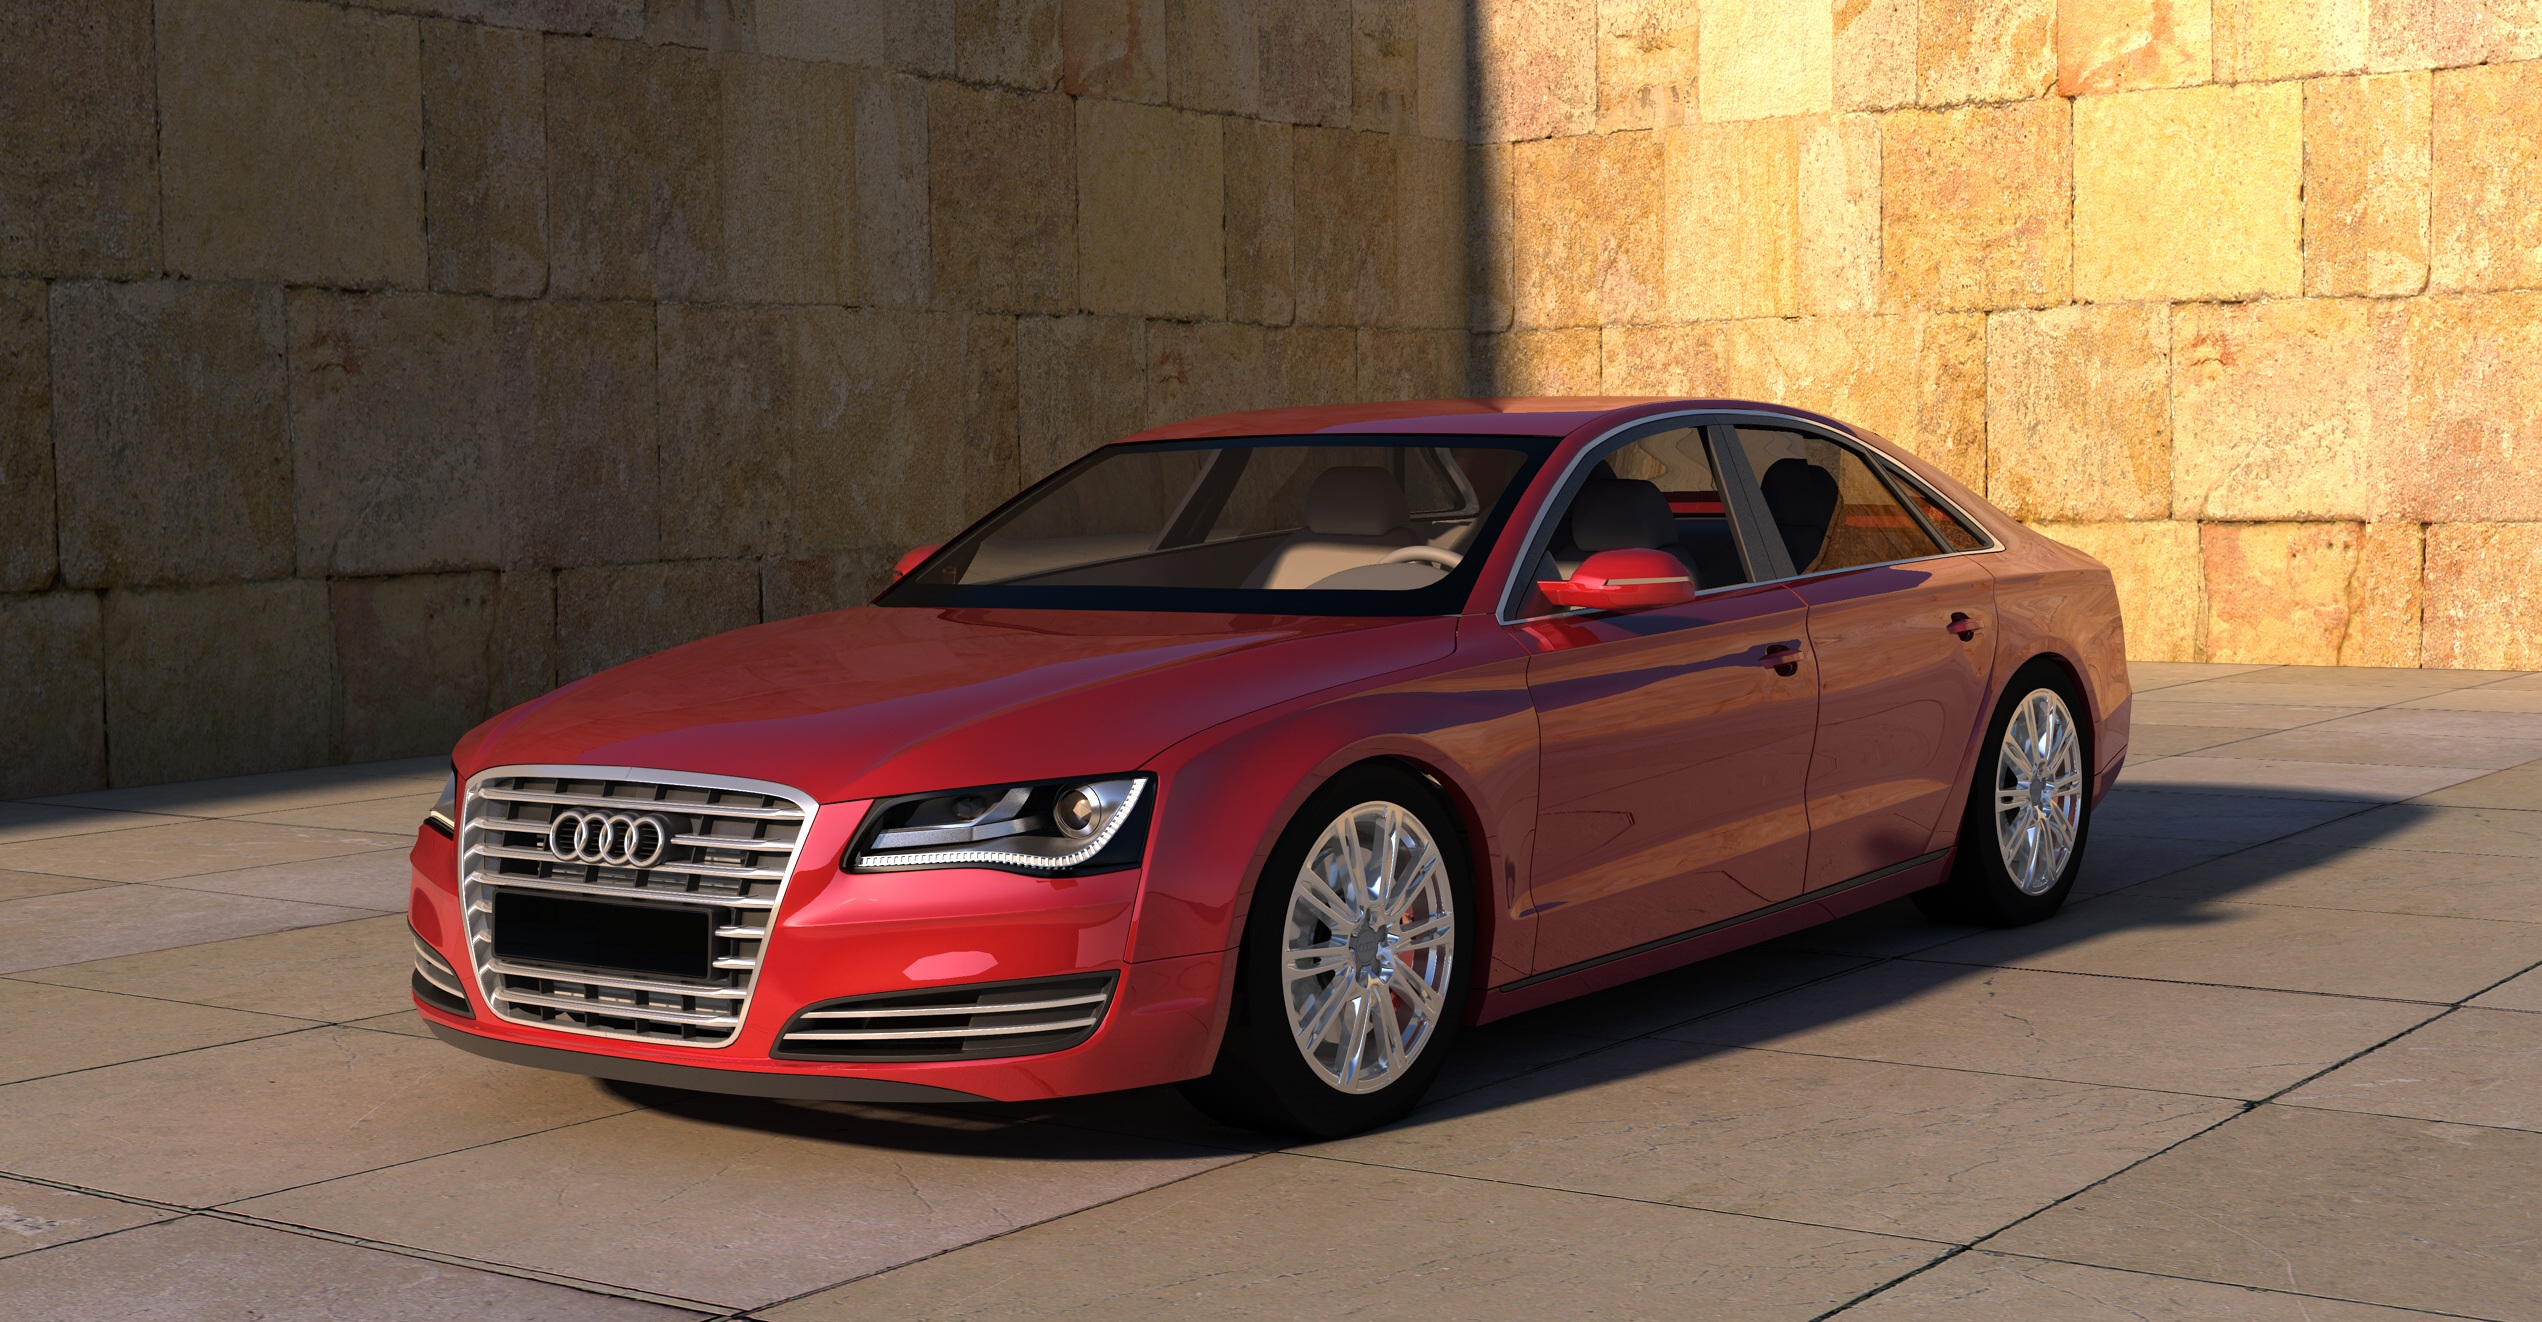 8k Car Wallpaper Download Audi A8 Red Wallpaper Background